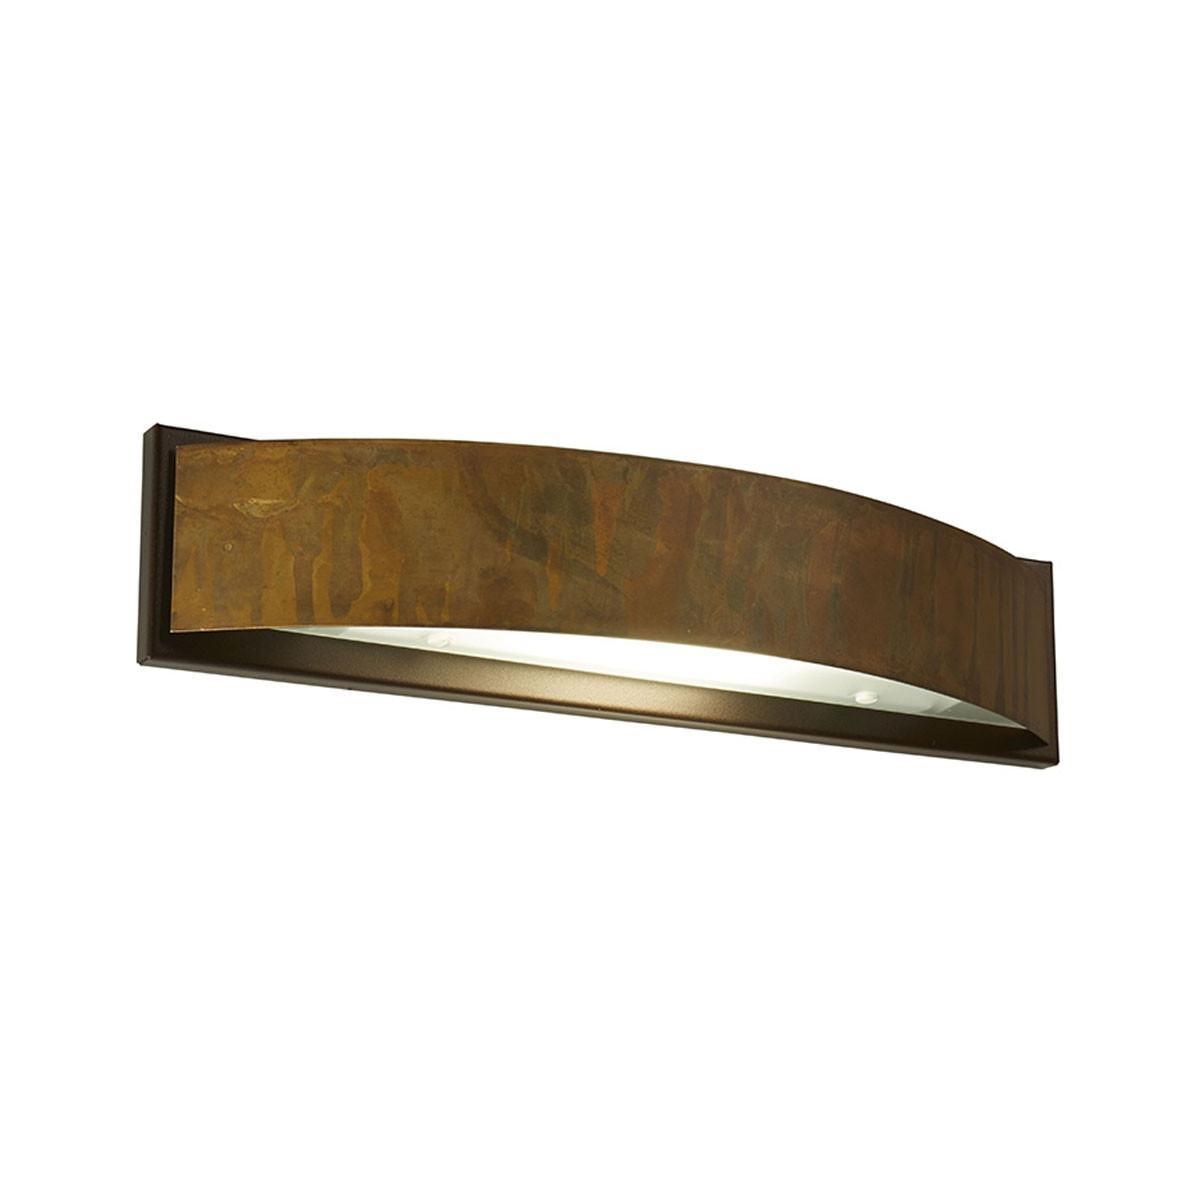 Gibas LOLA Wall Light - Large/Round - Distressed Brass